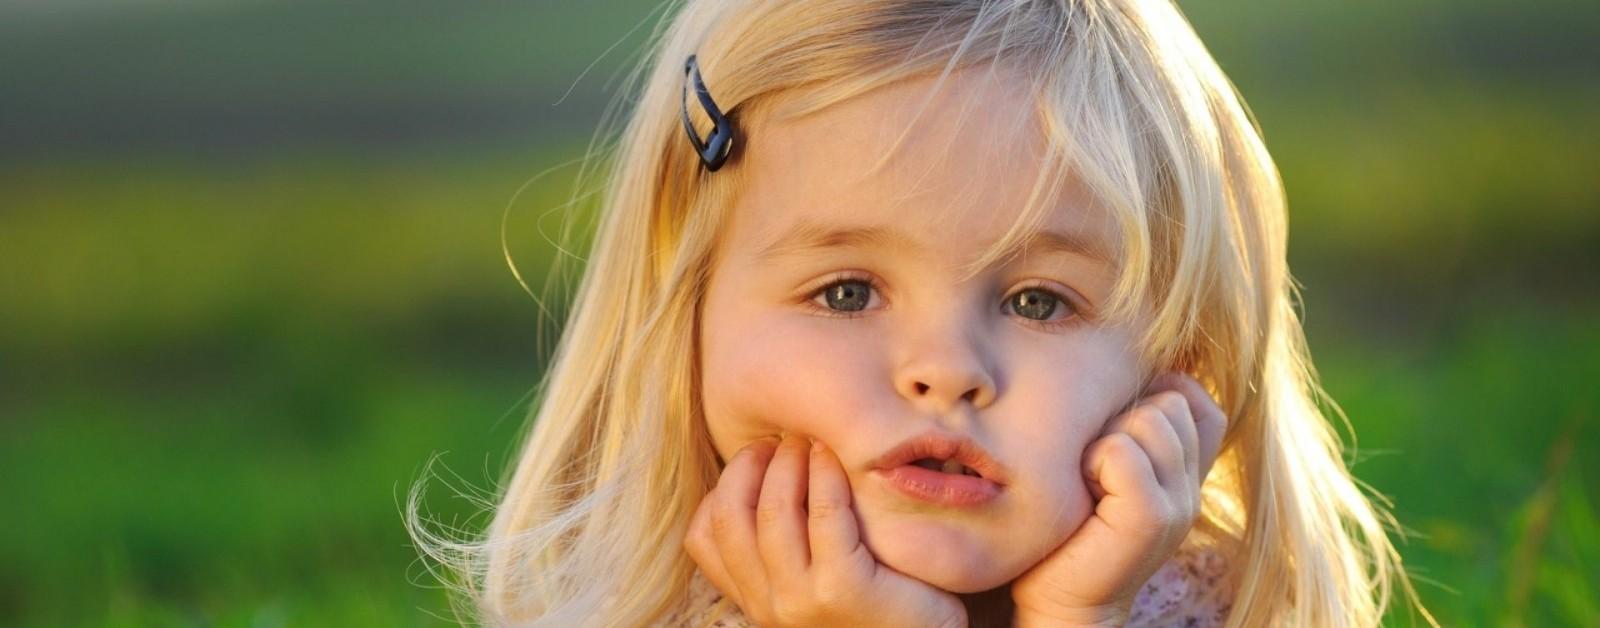 Premier Childrens Consignment Sale